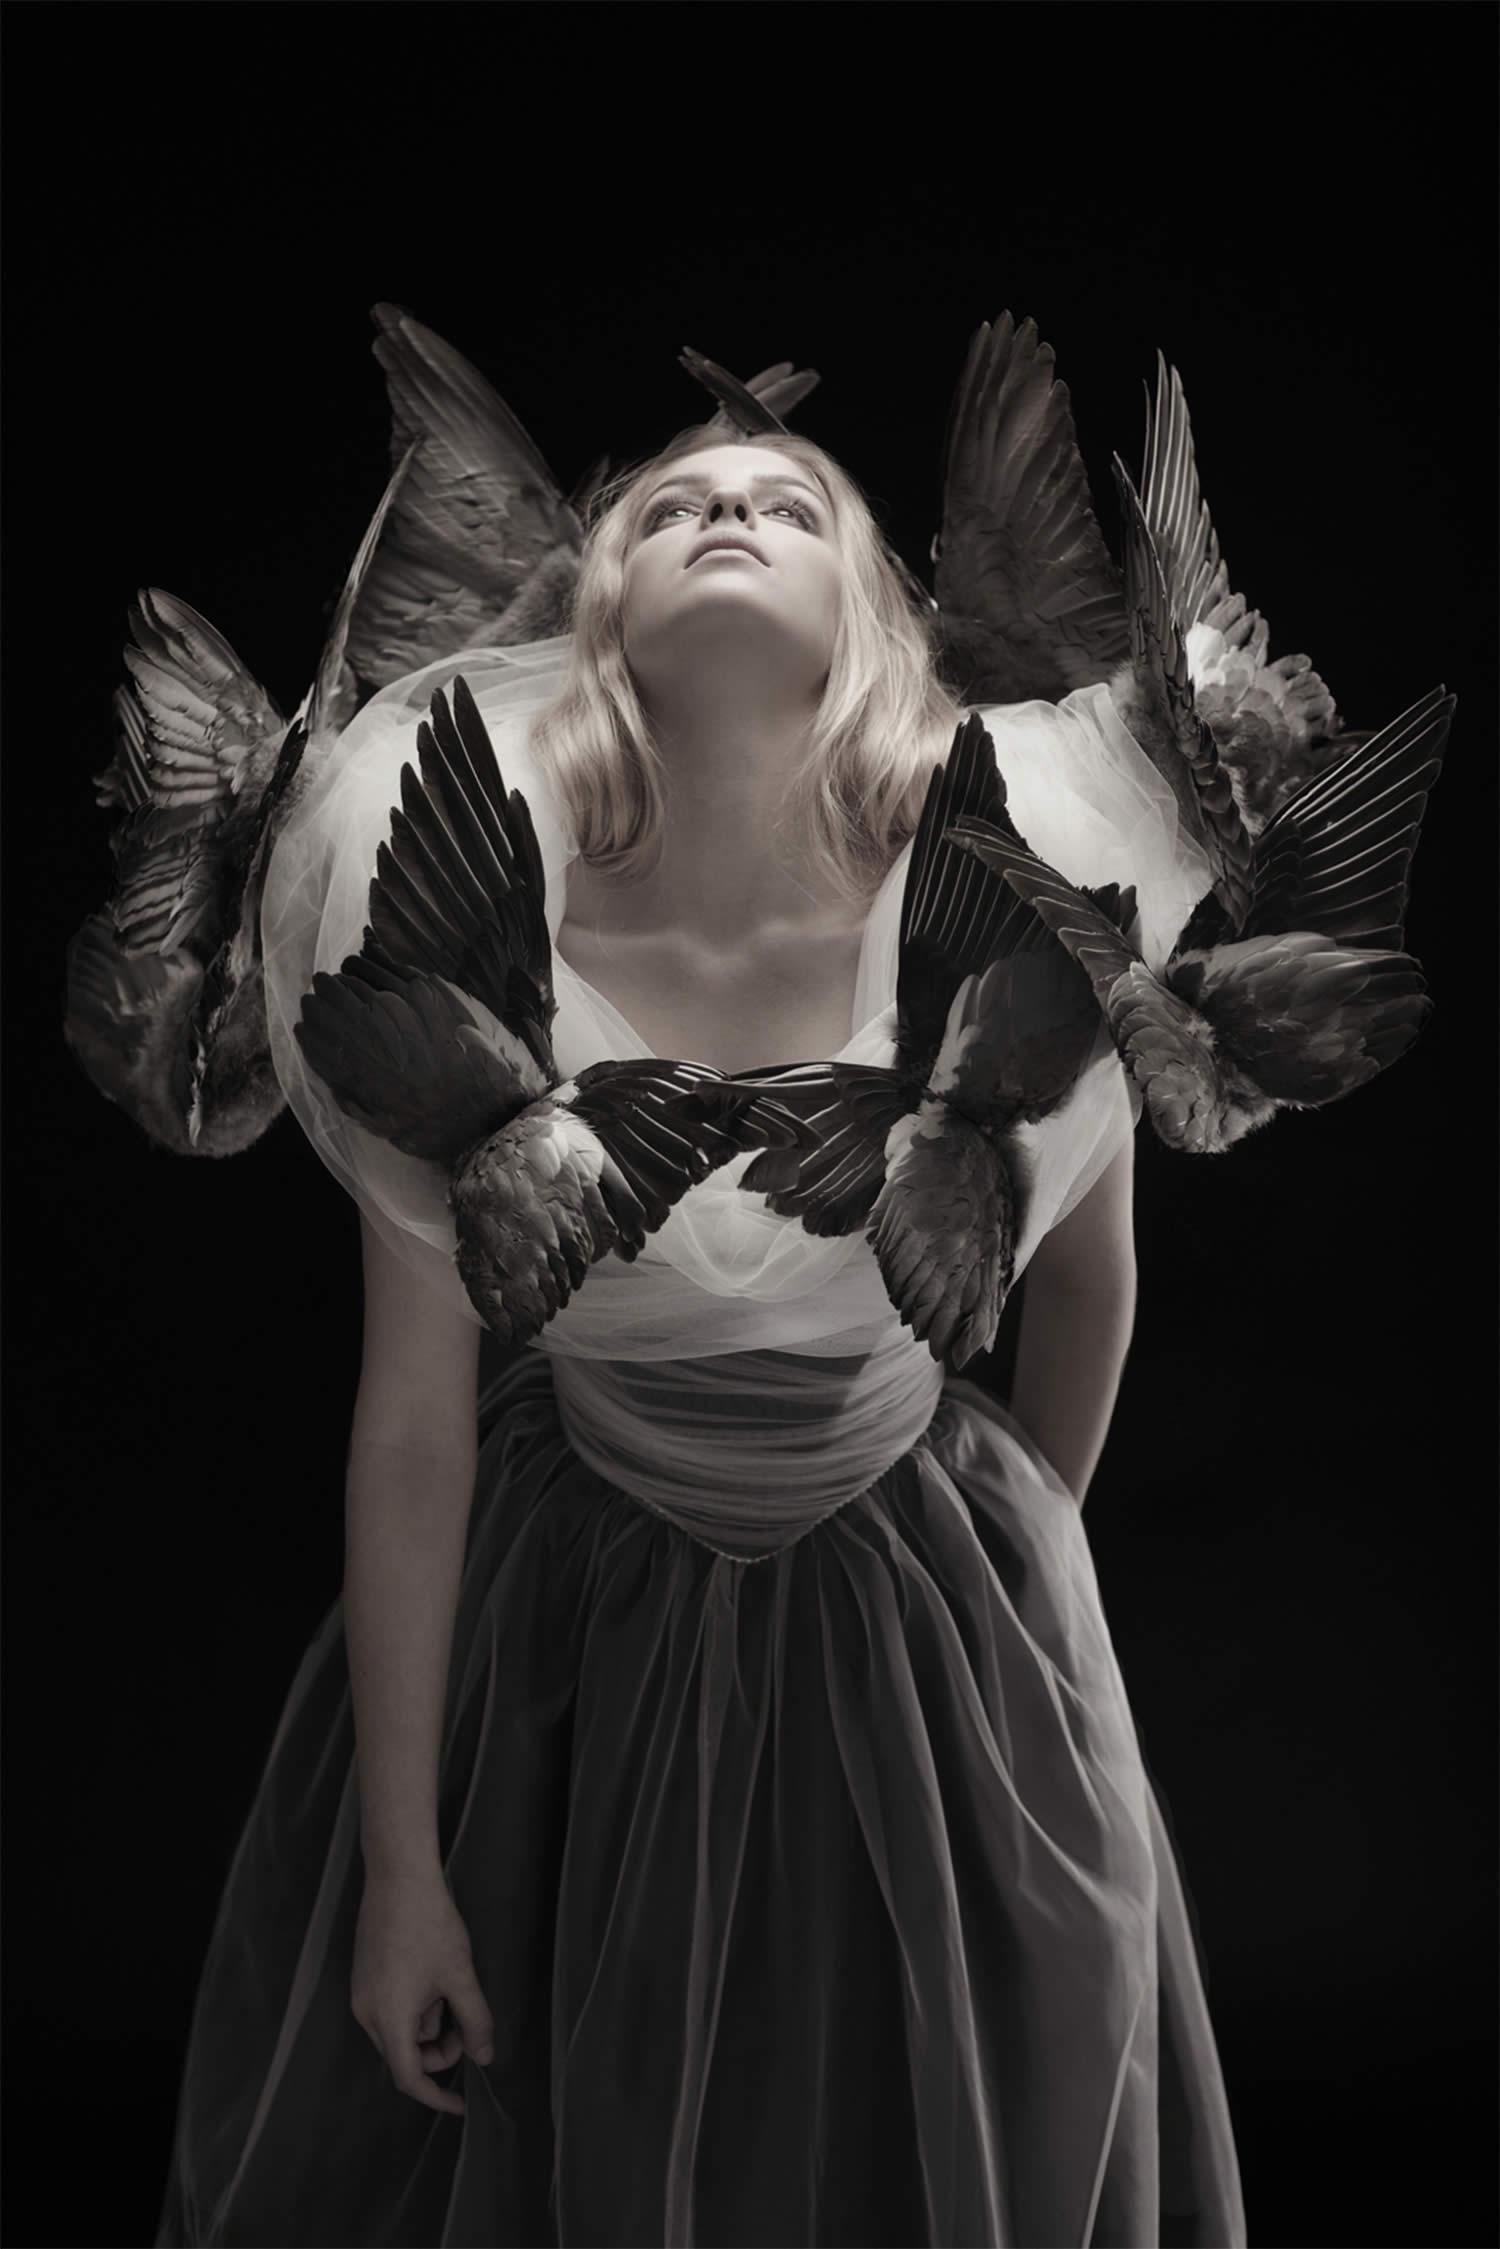 bird wings around blonde girl, roadkill couture